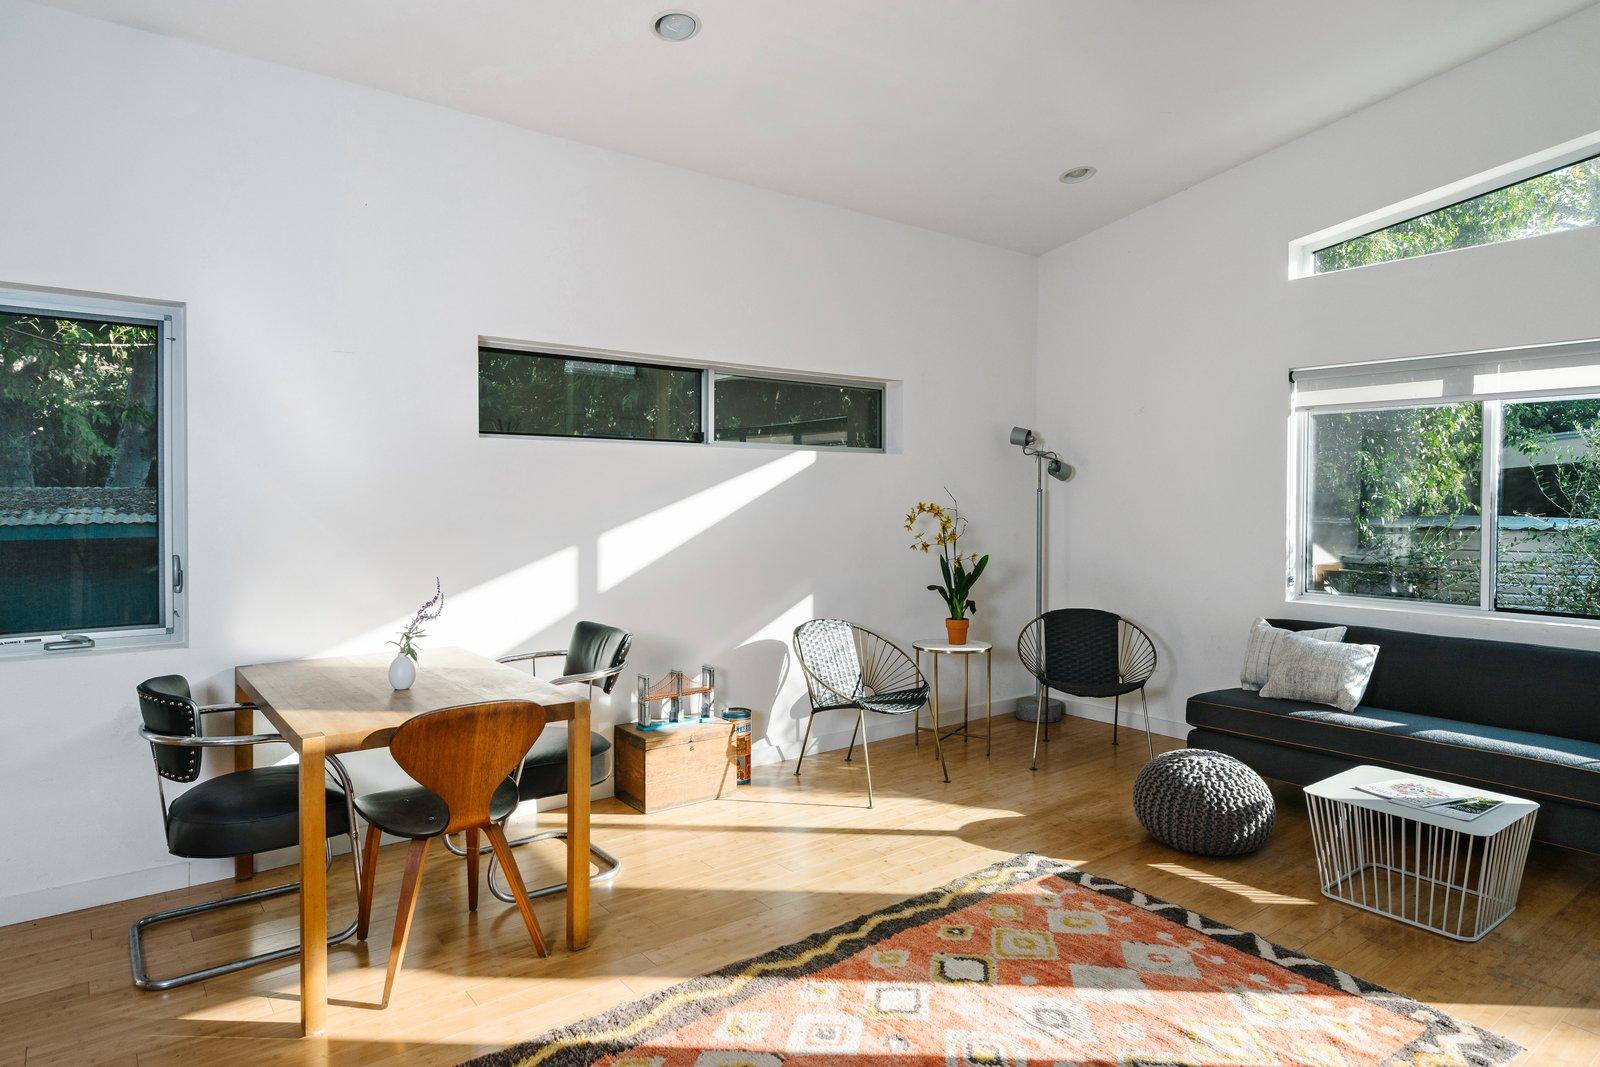 Casita 850 living room